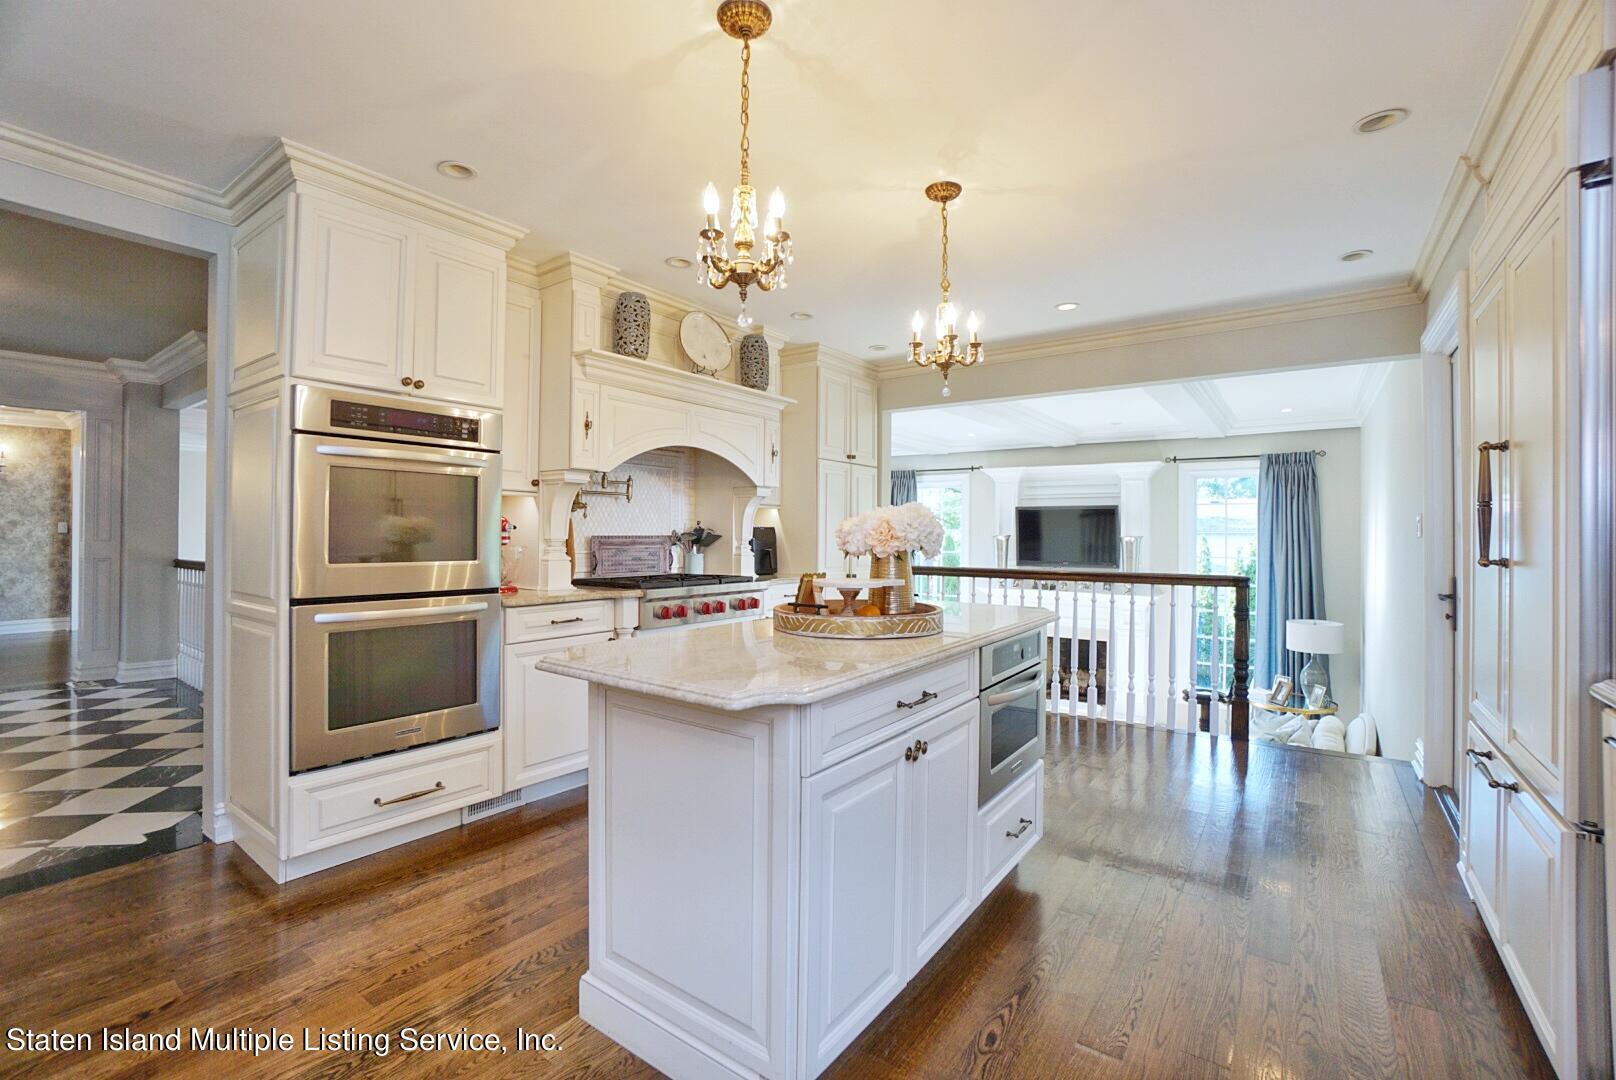 Single Family - Detached 116 Fine Blvd   Staten Island, NY 10314, MLS-1148291-22